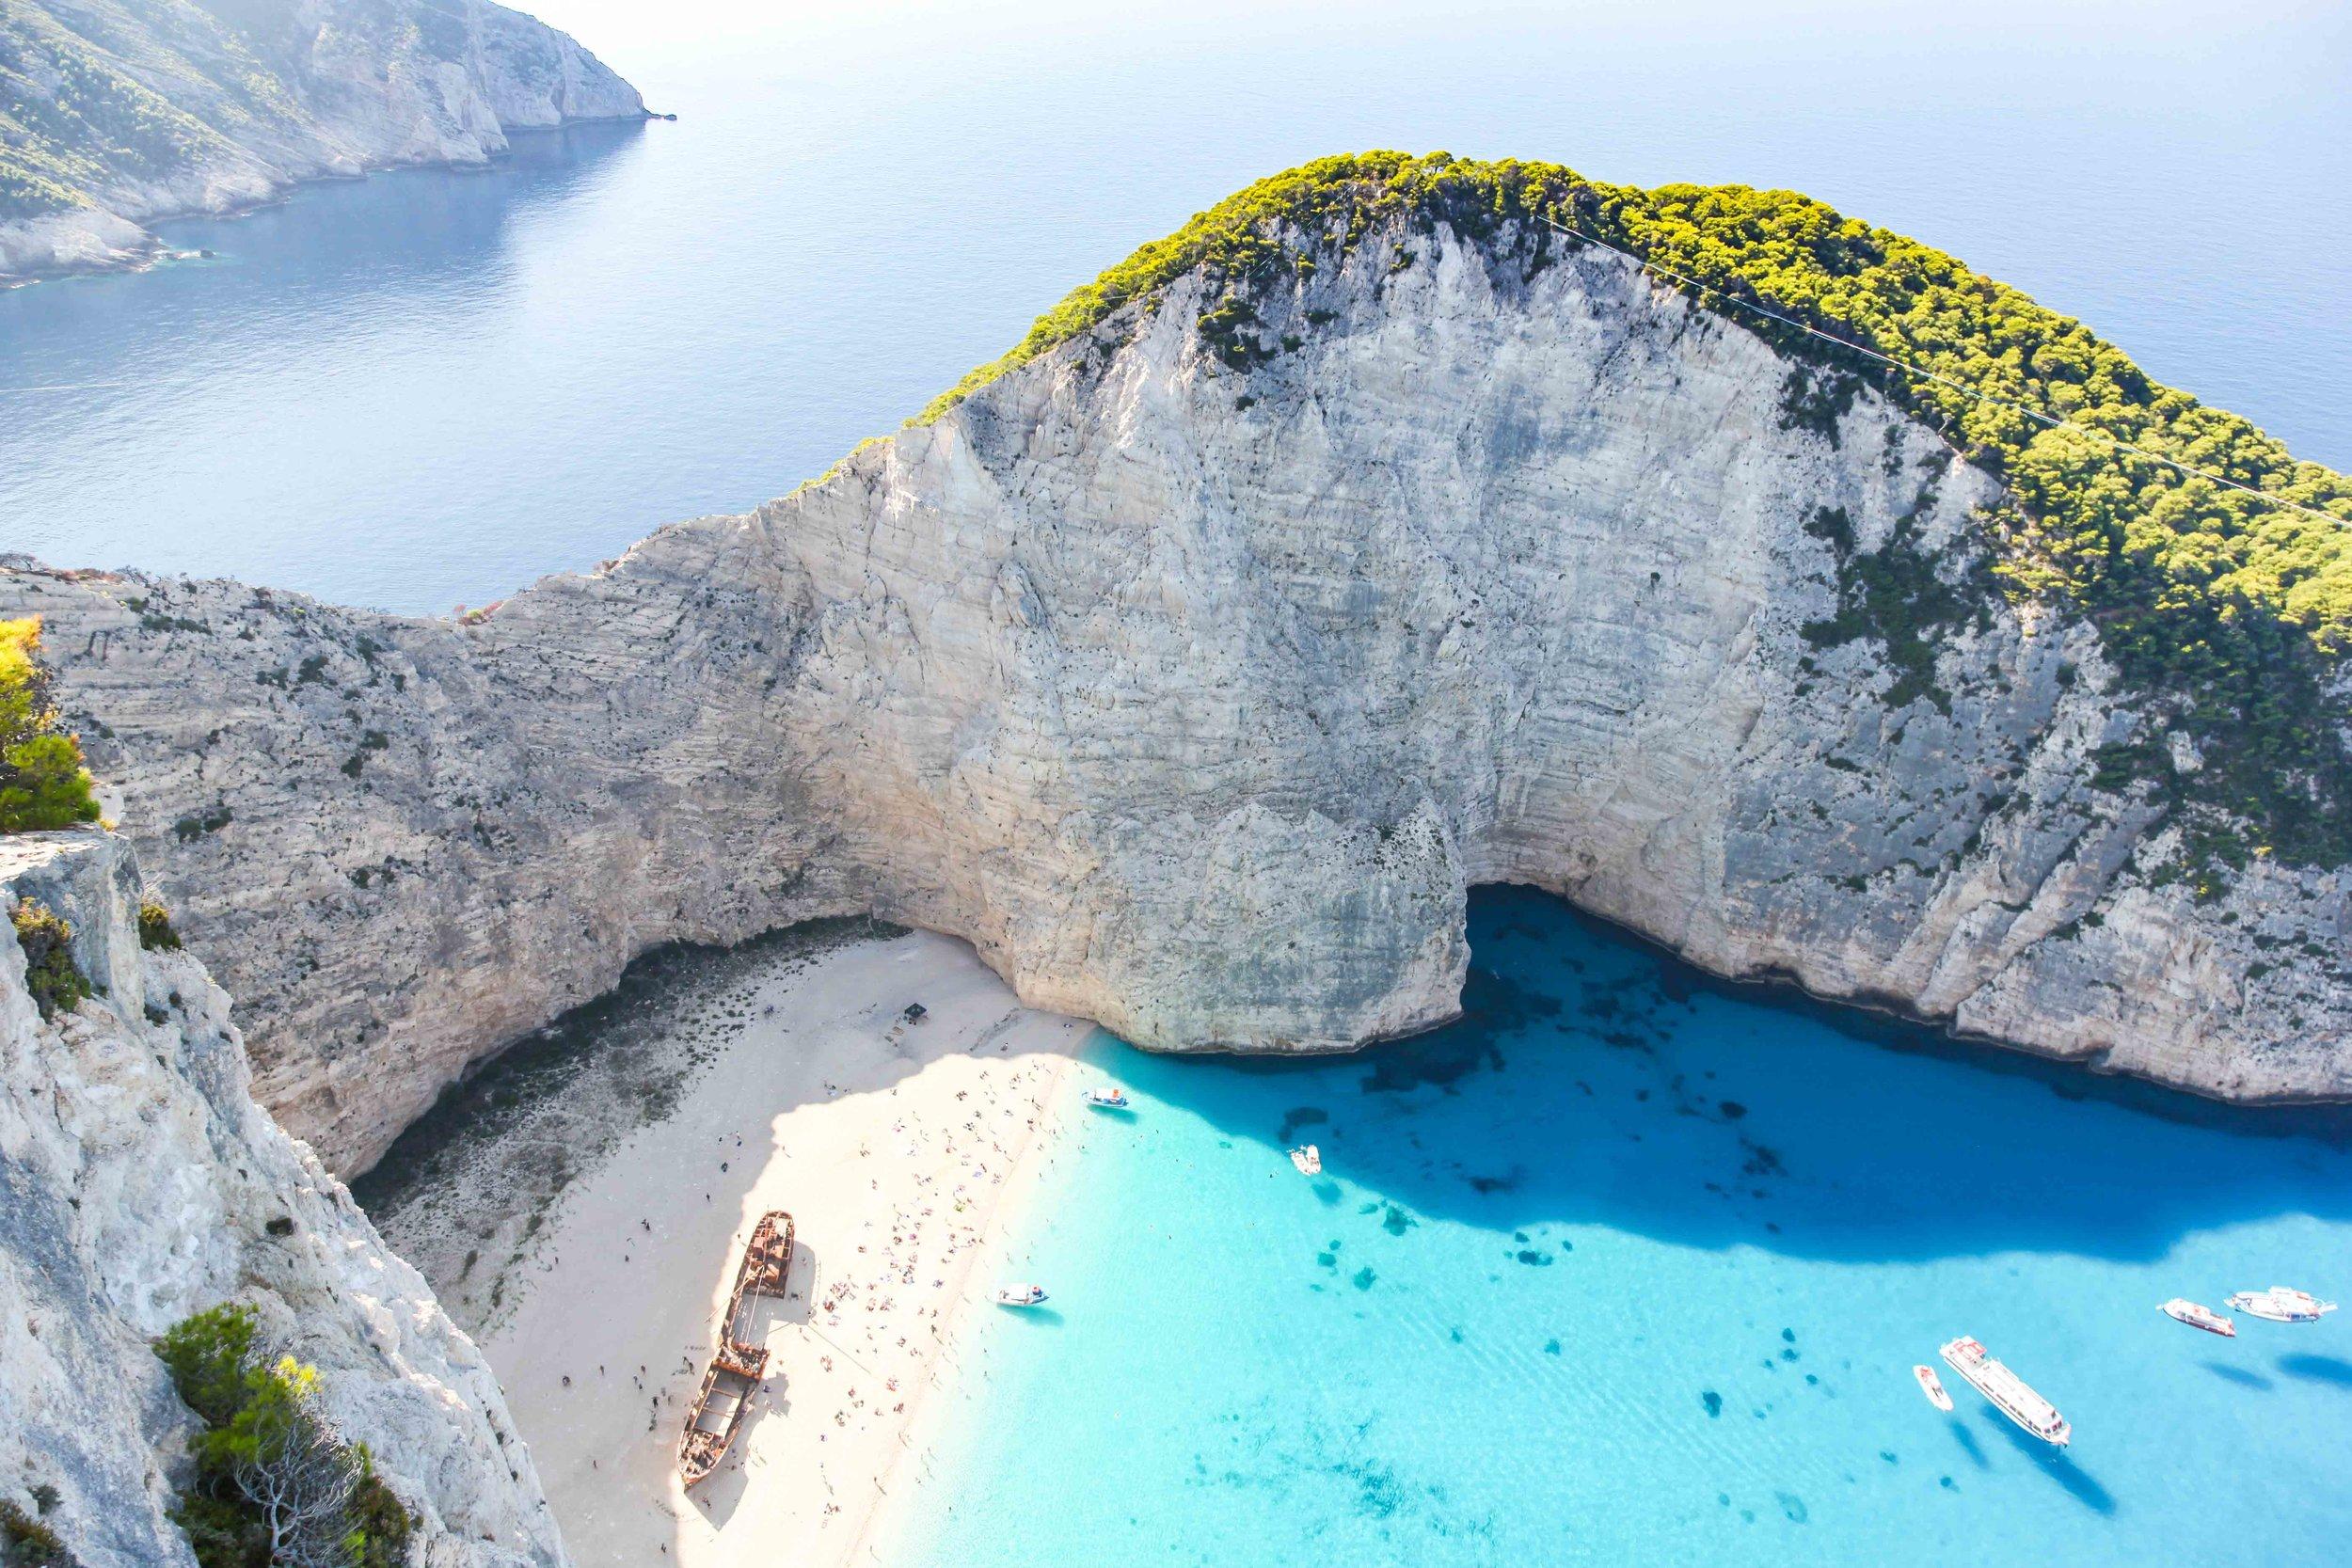 IMG_0536-shipwreck-navagio-beach-zakynthos-greece-trisa-taro.jpg